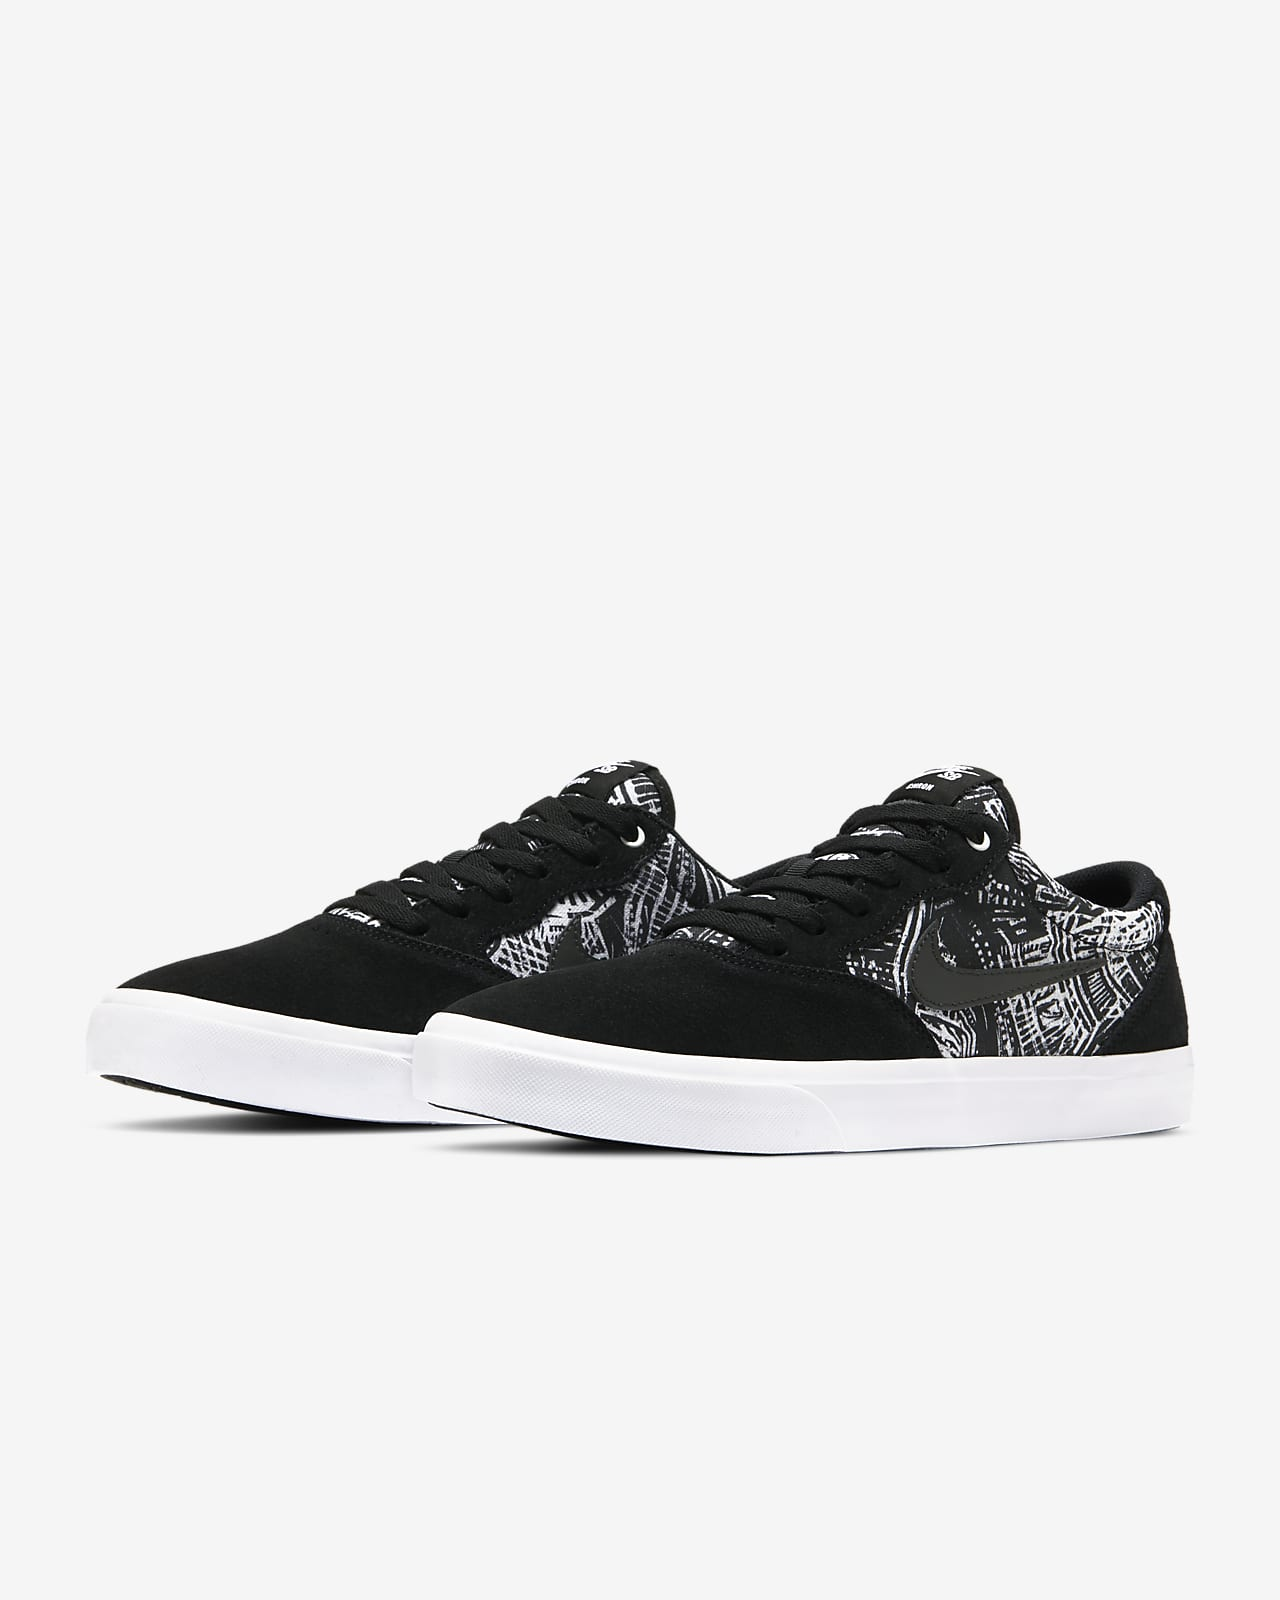 Nike SB Chron Solarsoft Premium Skate